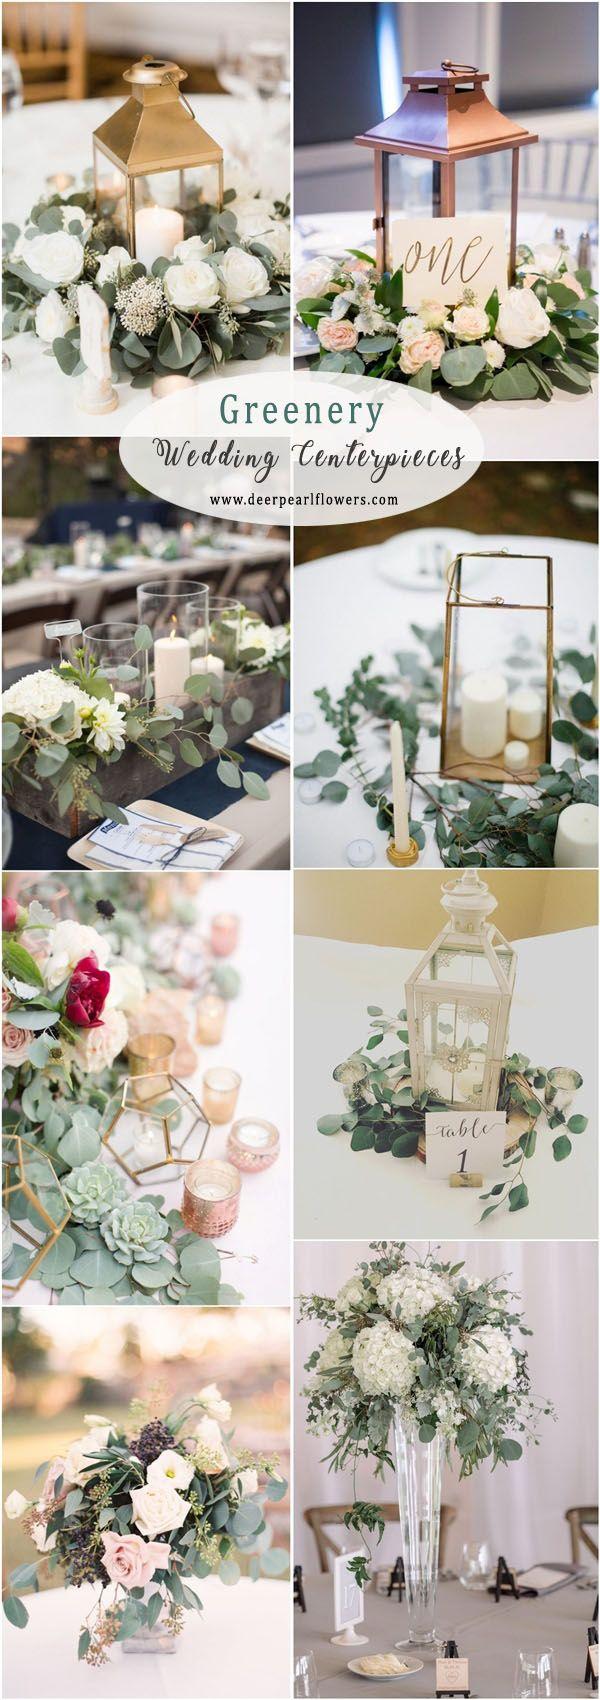 48 Eucalyptus Wedding Decor Ideas for 2018 | Rustic wedding ...